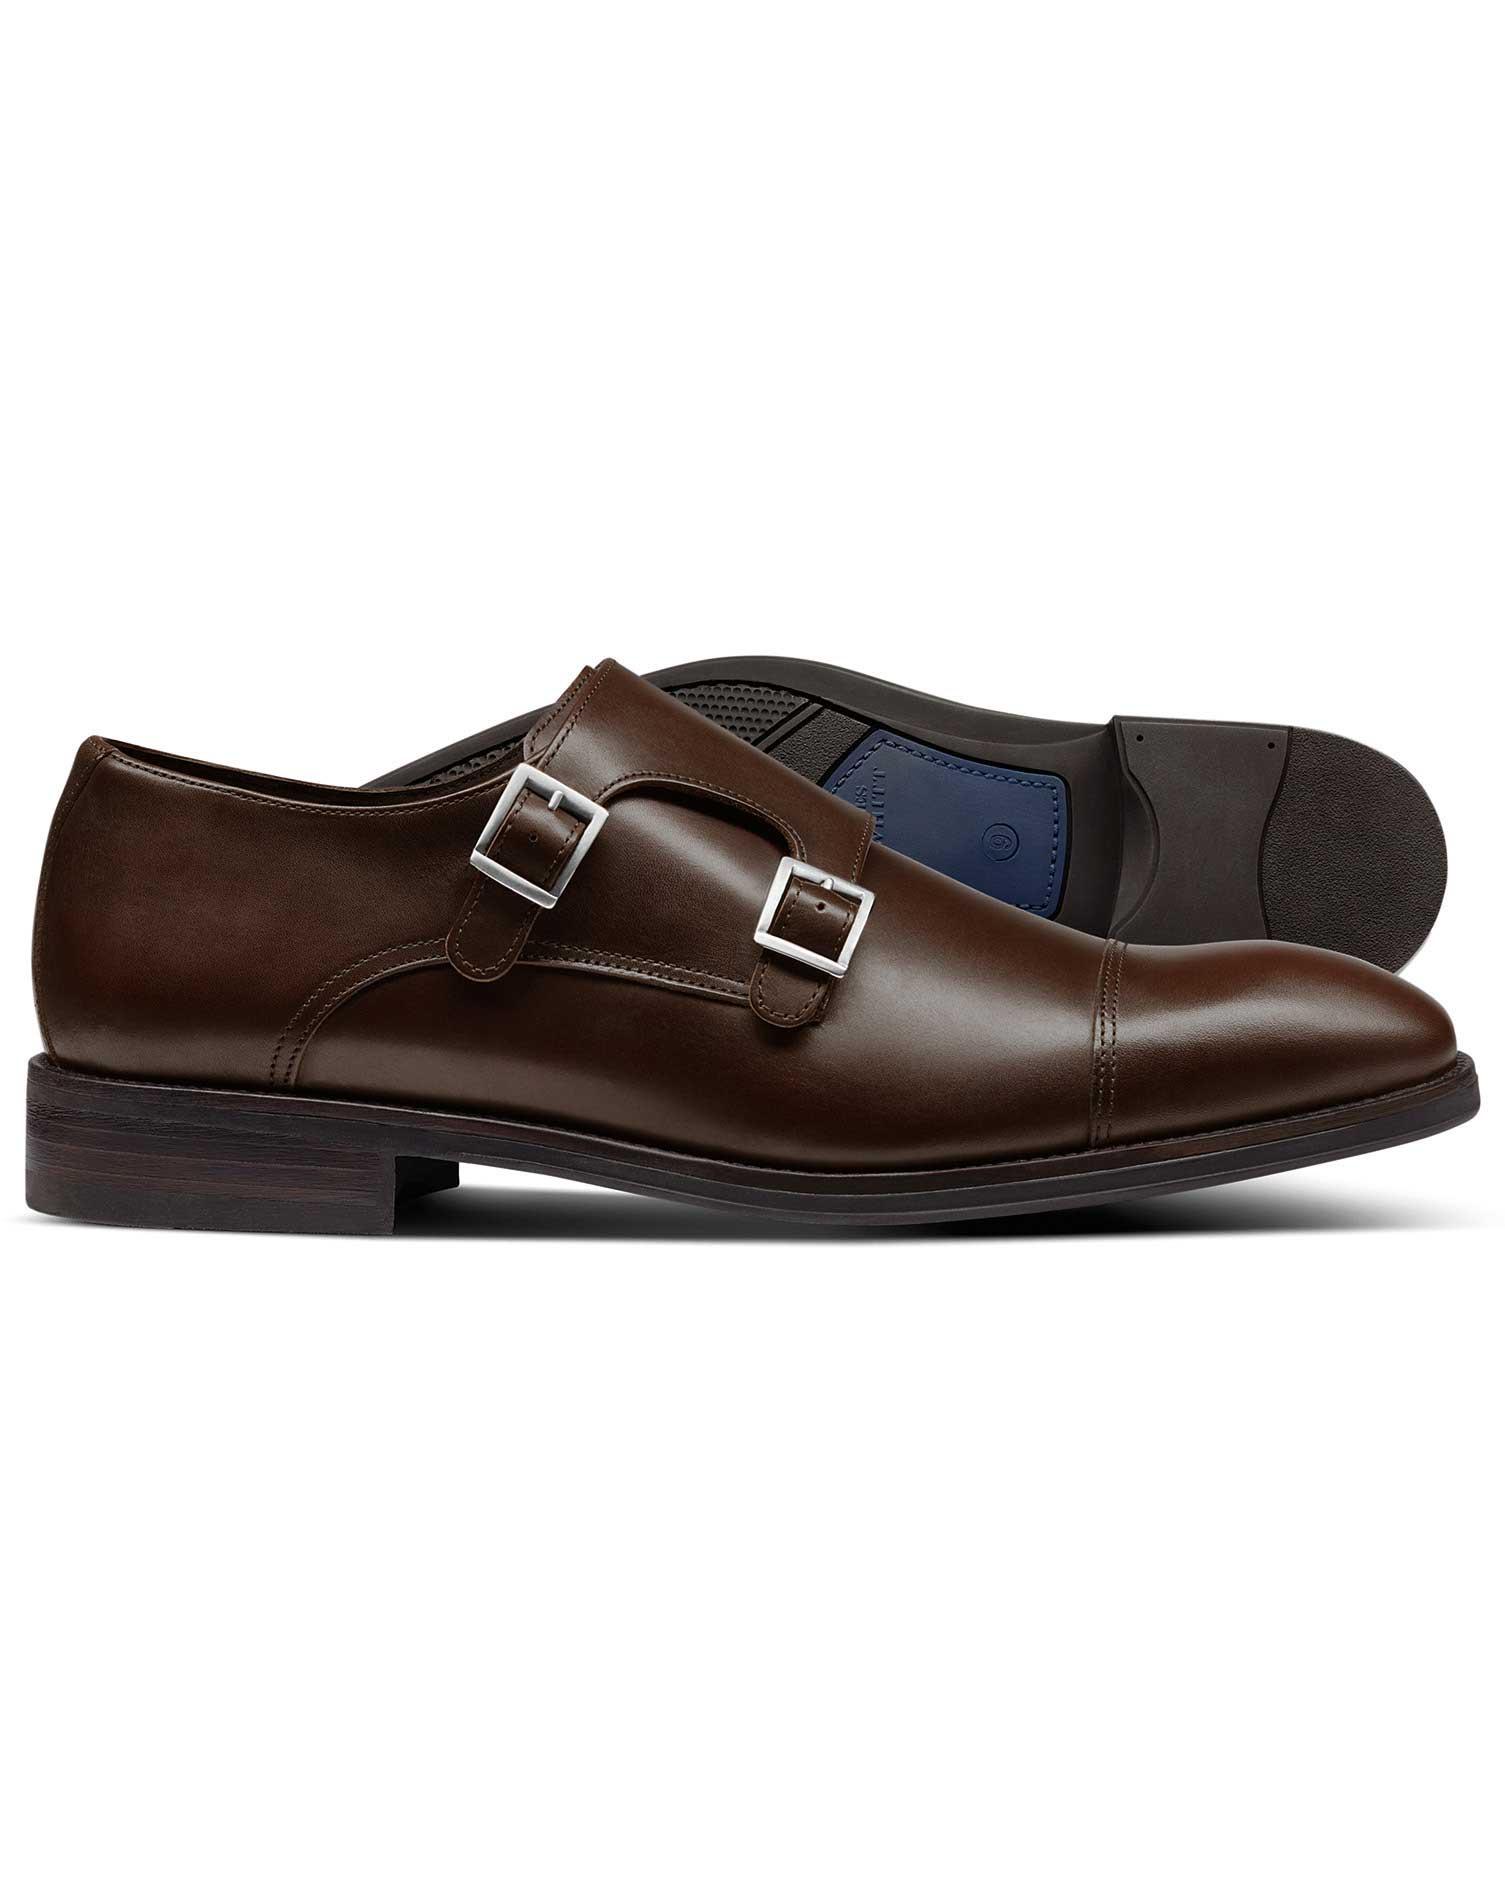 Silverwell copete puntera hebilla con Zapatos marrones con de 5IwRq0Sz e066f1538463